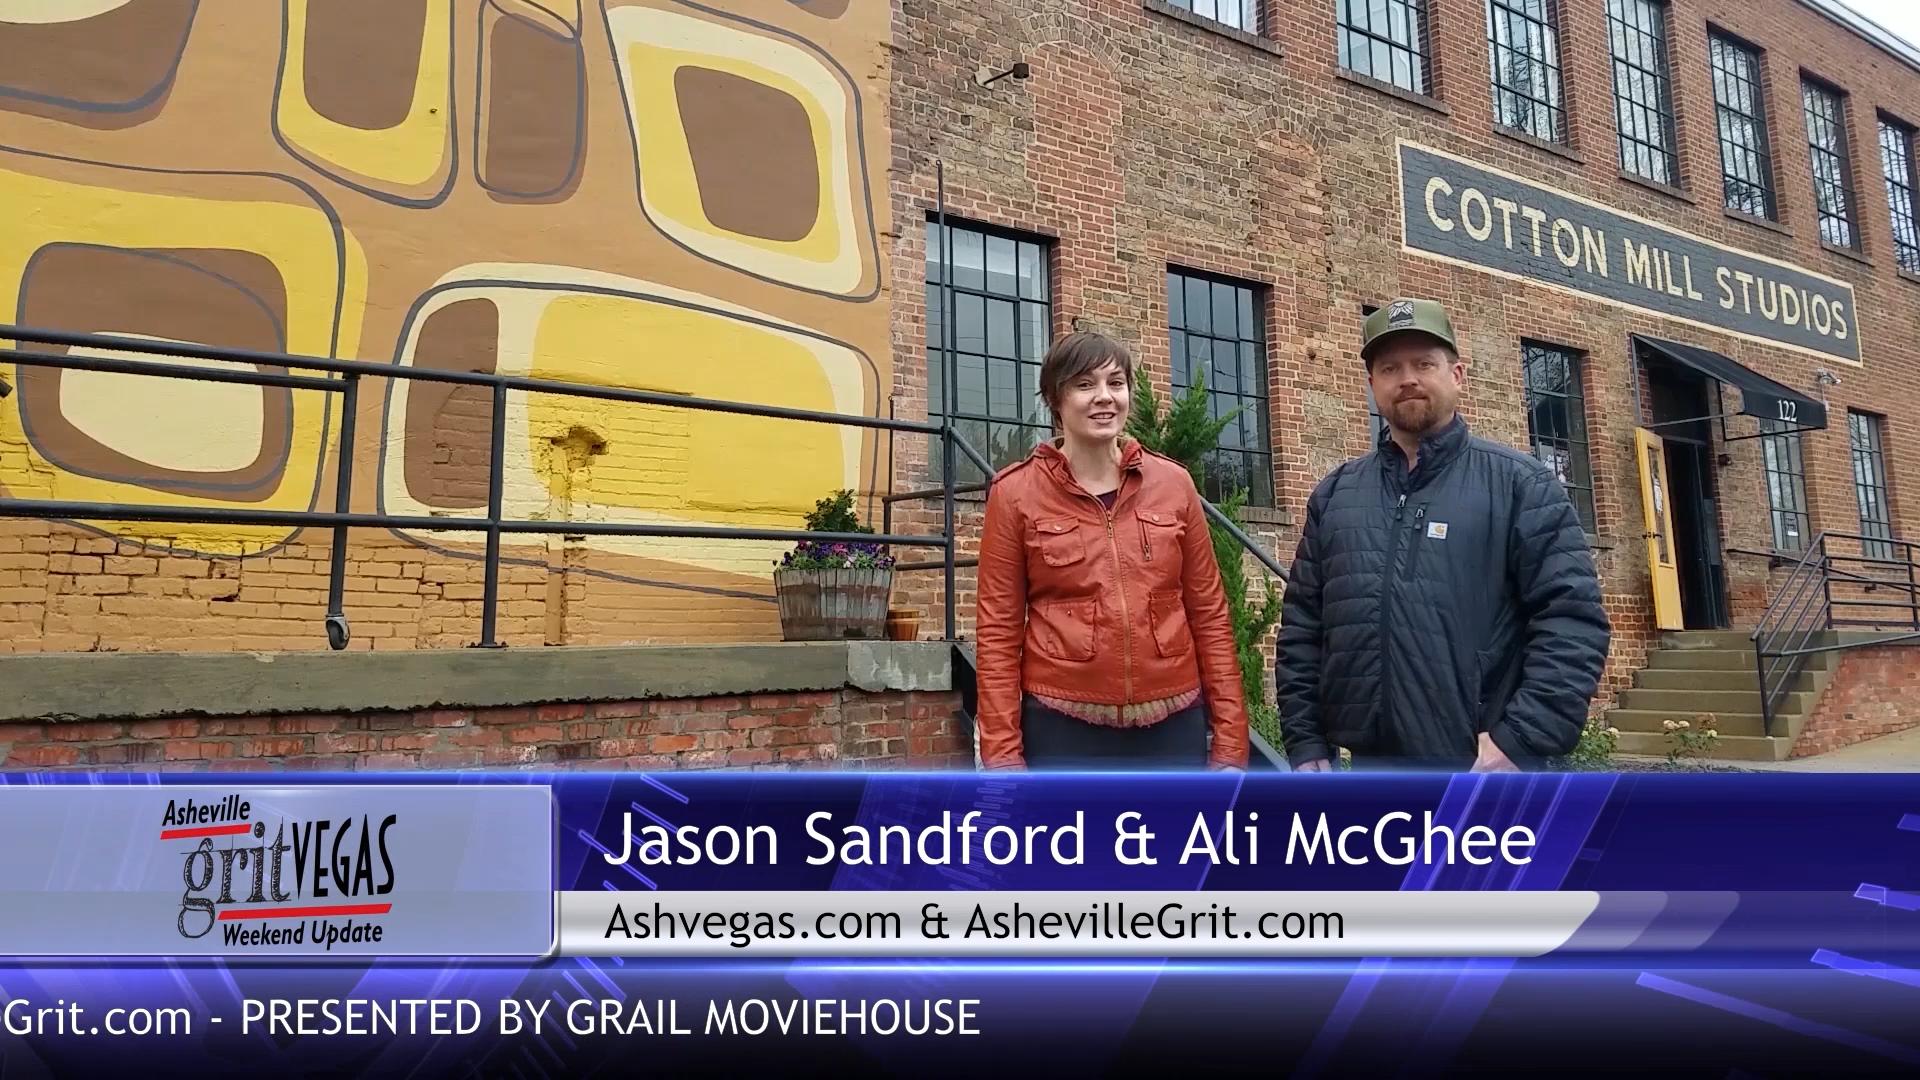 Cotton Mill Studios